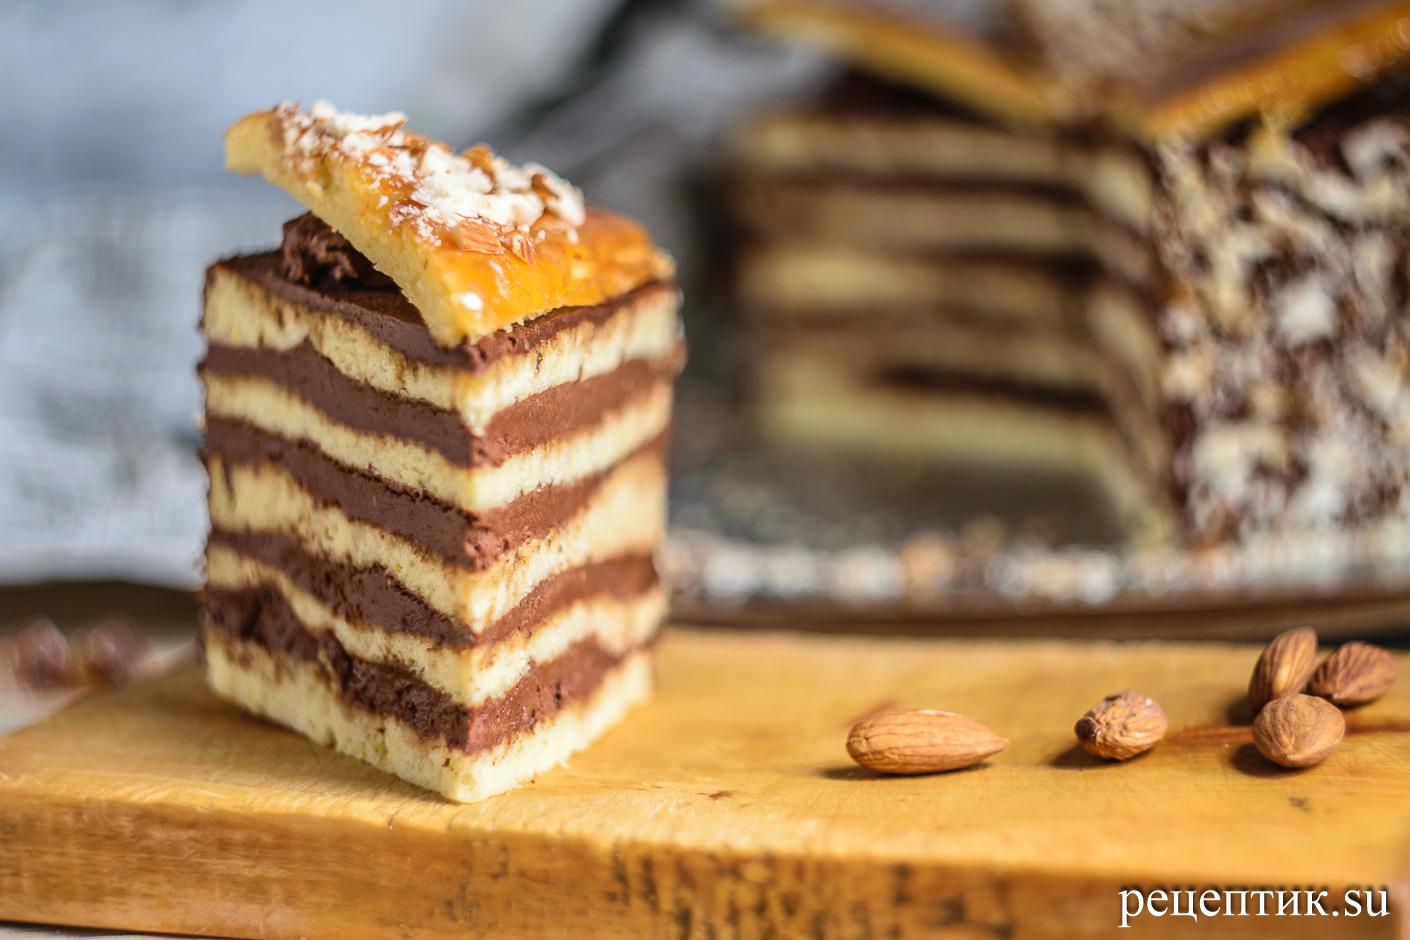 Торт «Добош» - рецепт с фото, результат